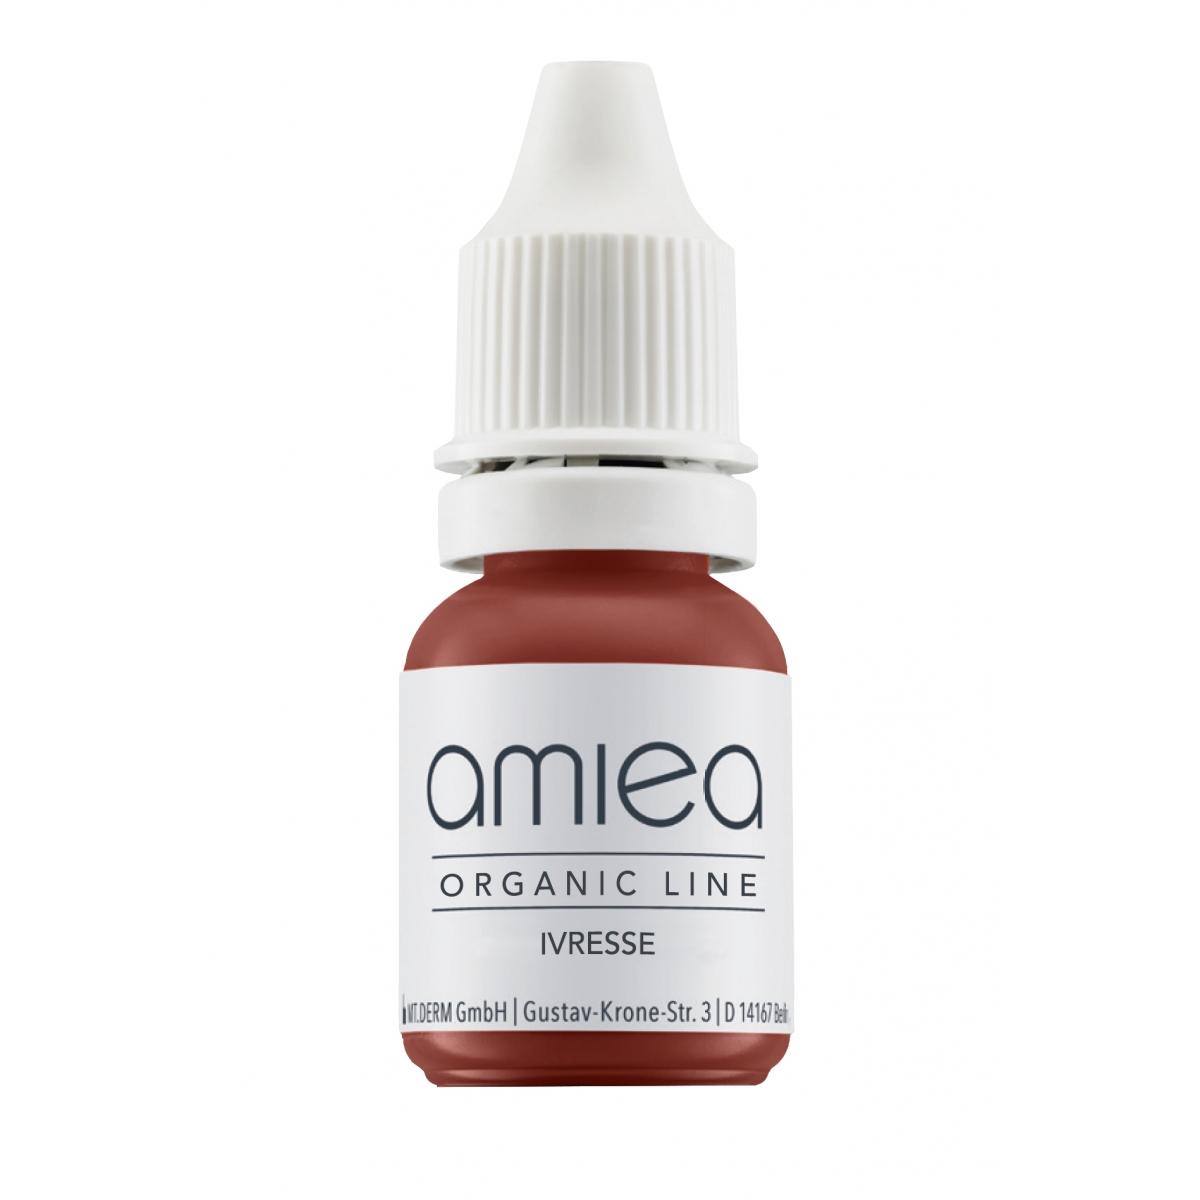 ORGANIC LINE (5ml)  - PIGMENT IVRESSE ORGANICLINE AMIEA (5 ml)